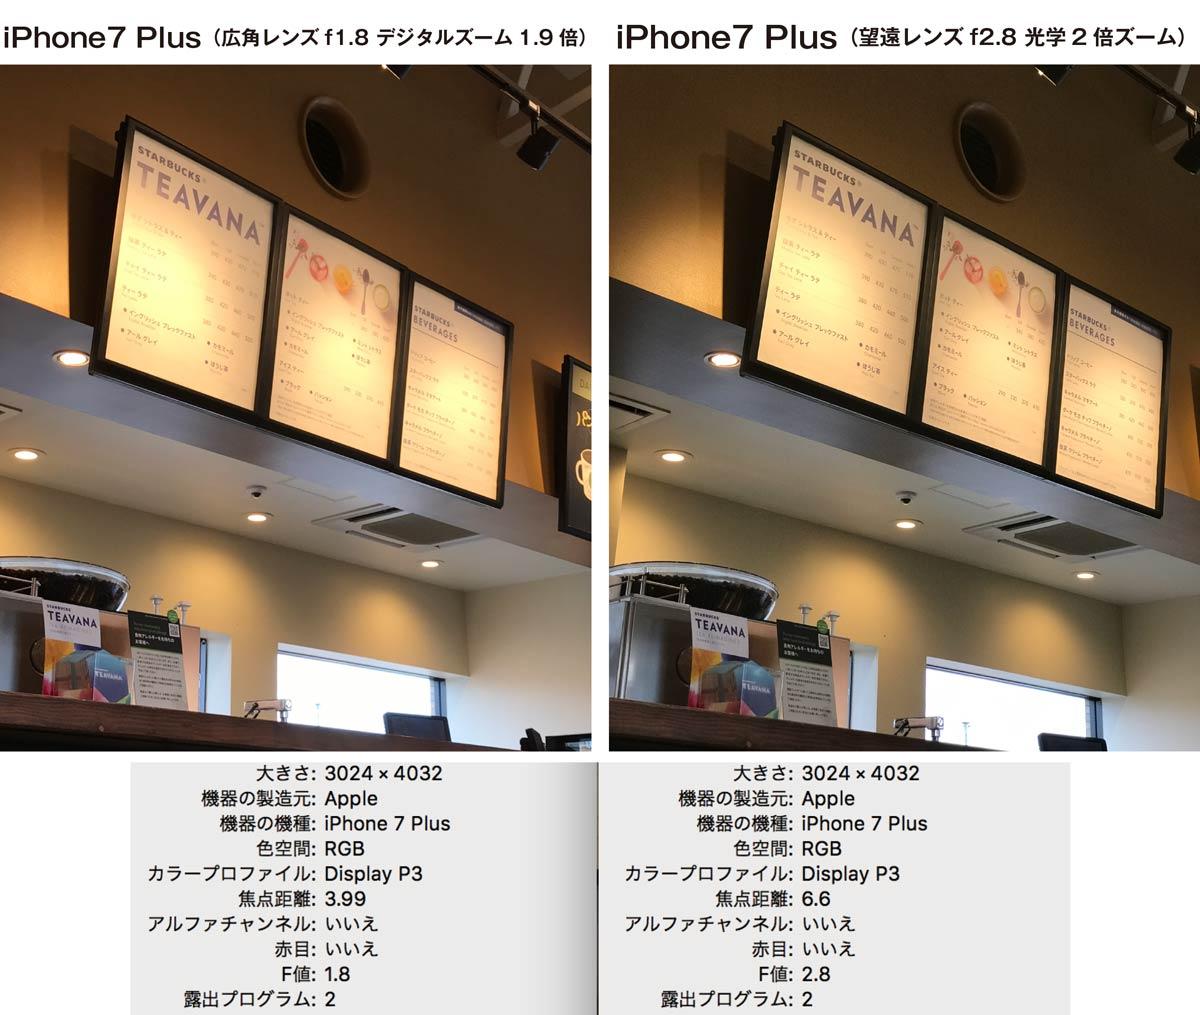 iPhone7 Plus レンズの比較1